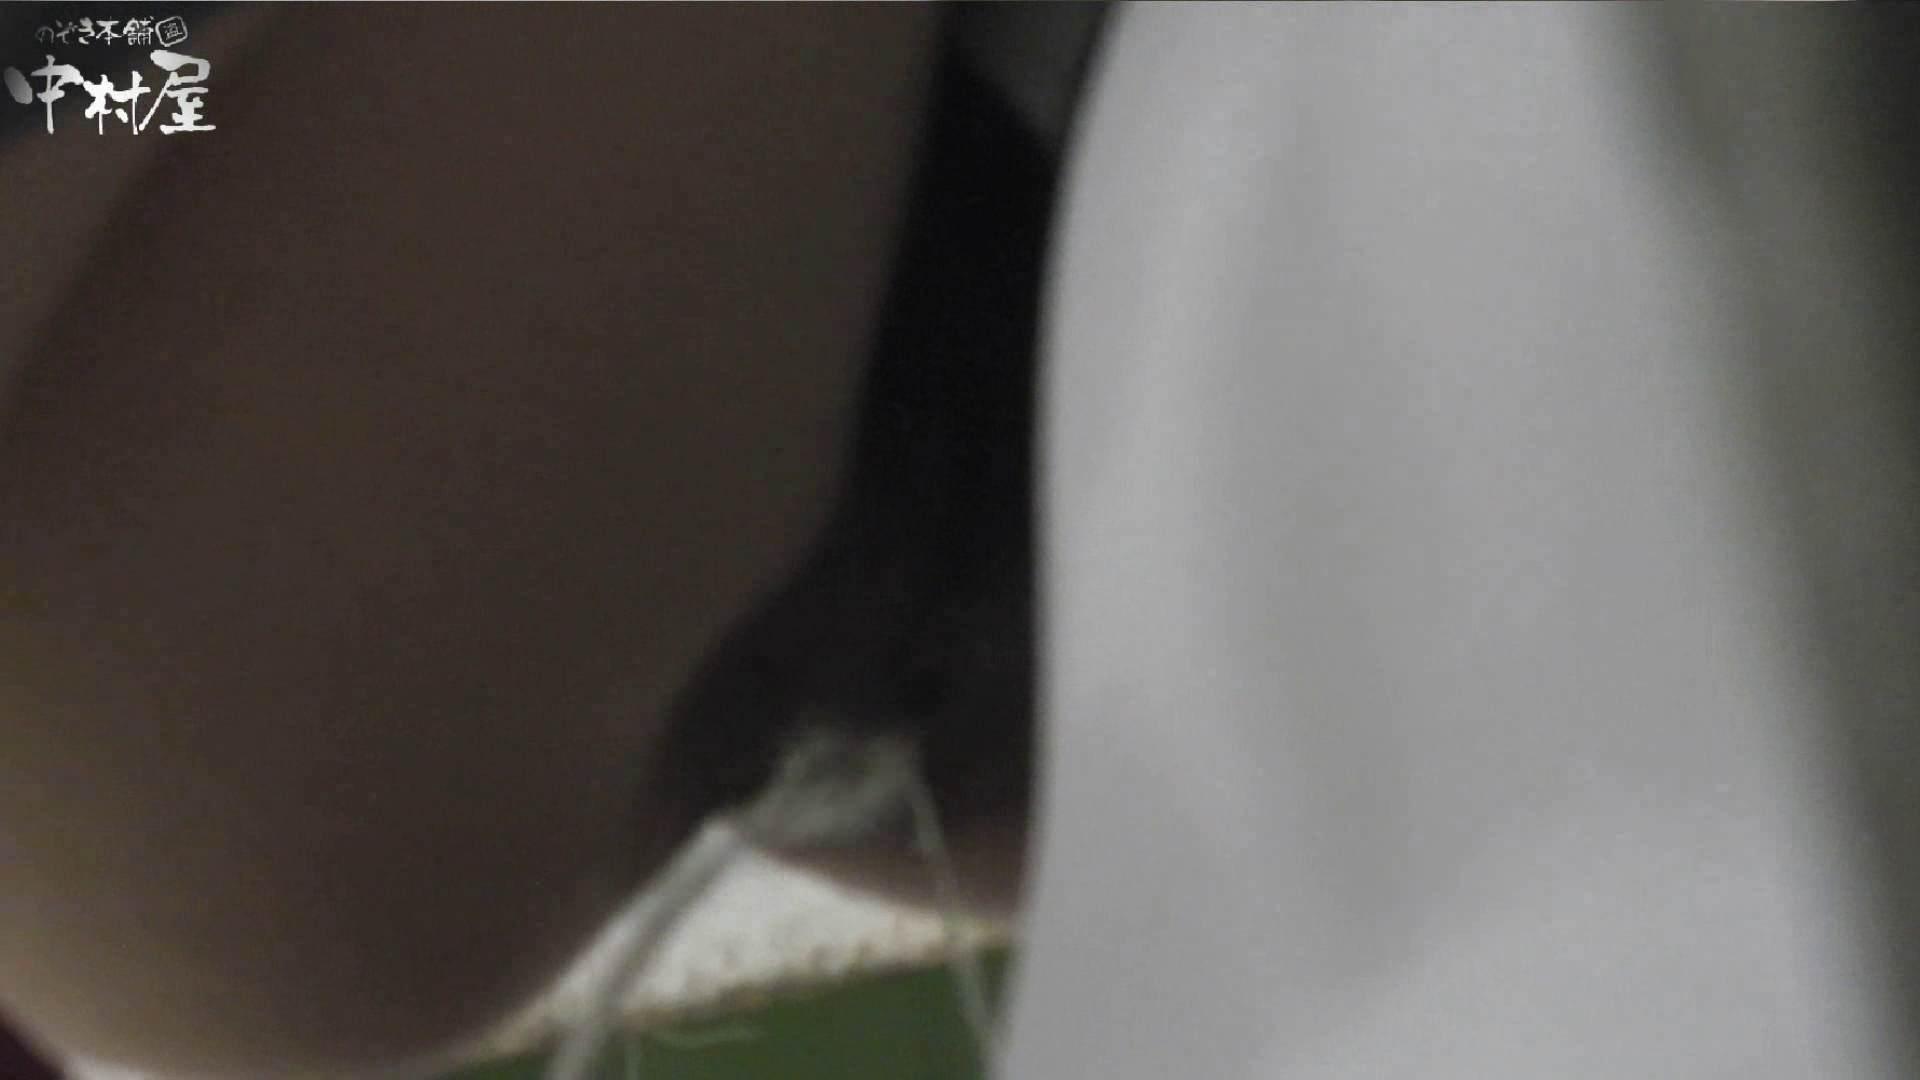 vol.41 命がけ潜伏洗面所! 毛薄め・硬度並・推定250g プライベート 盗撮画像 54連発 24